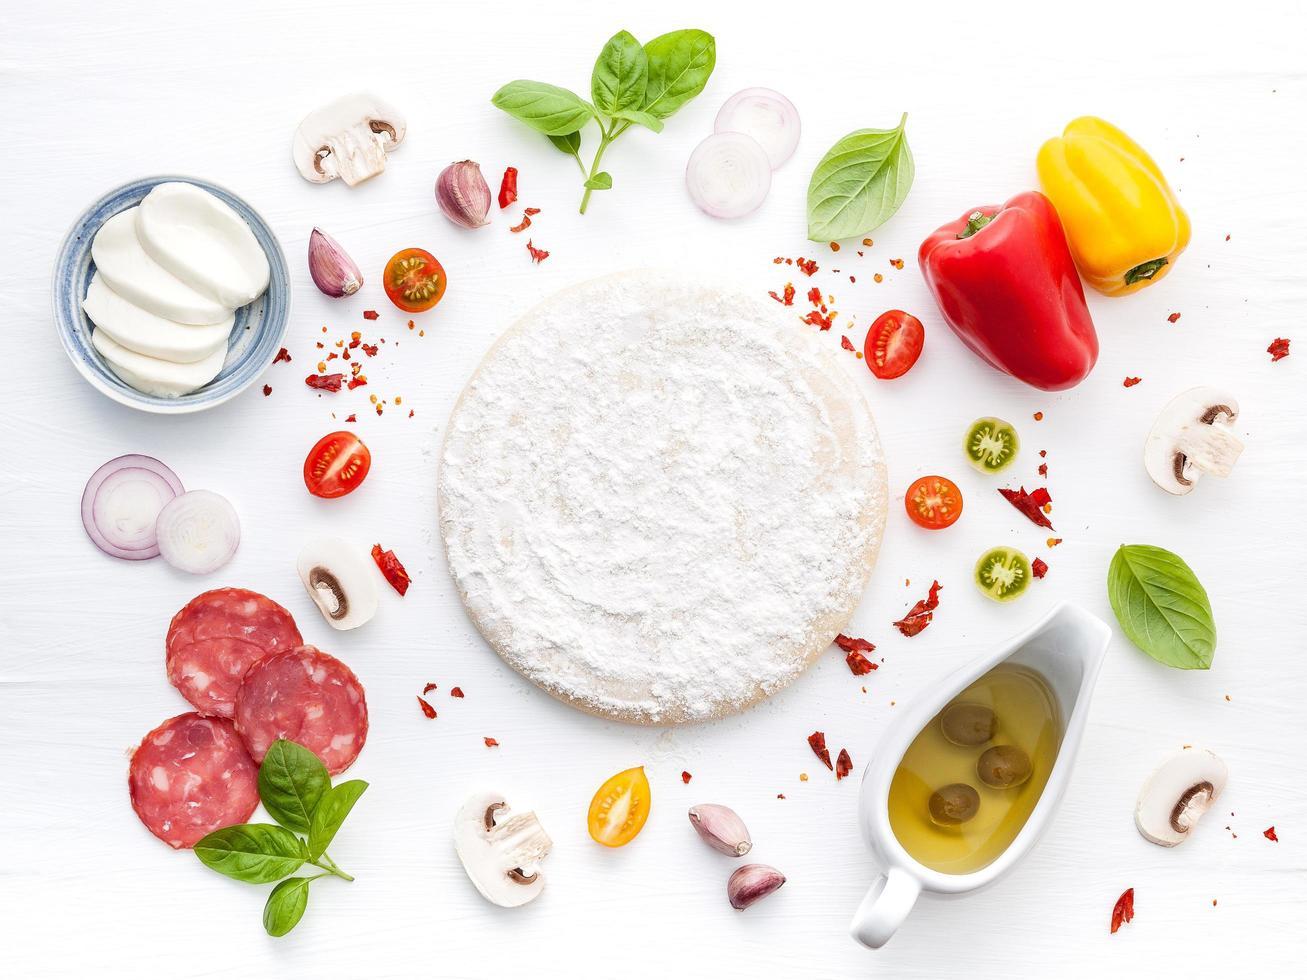 masa de pizza fresca e ingredientes foto